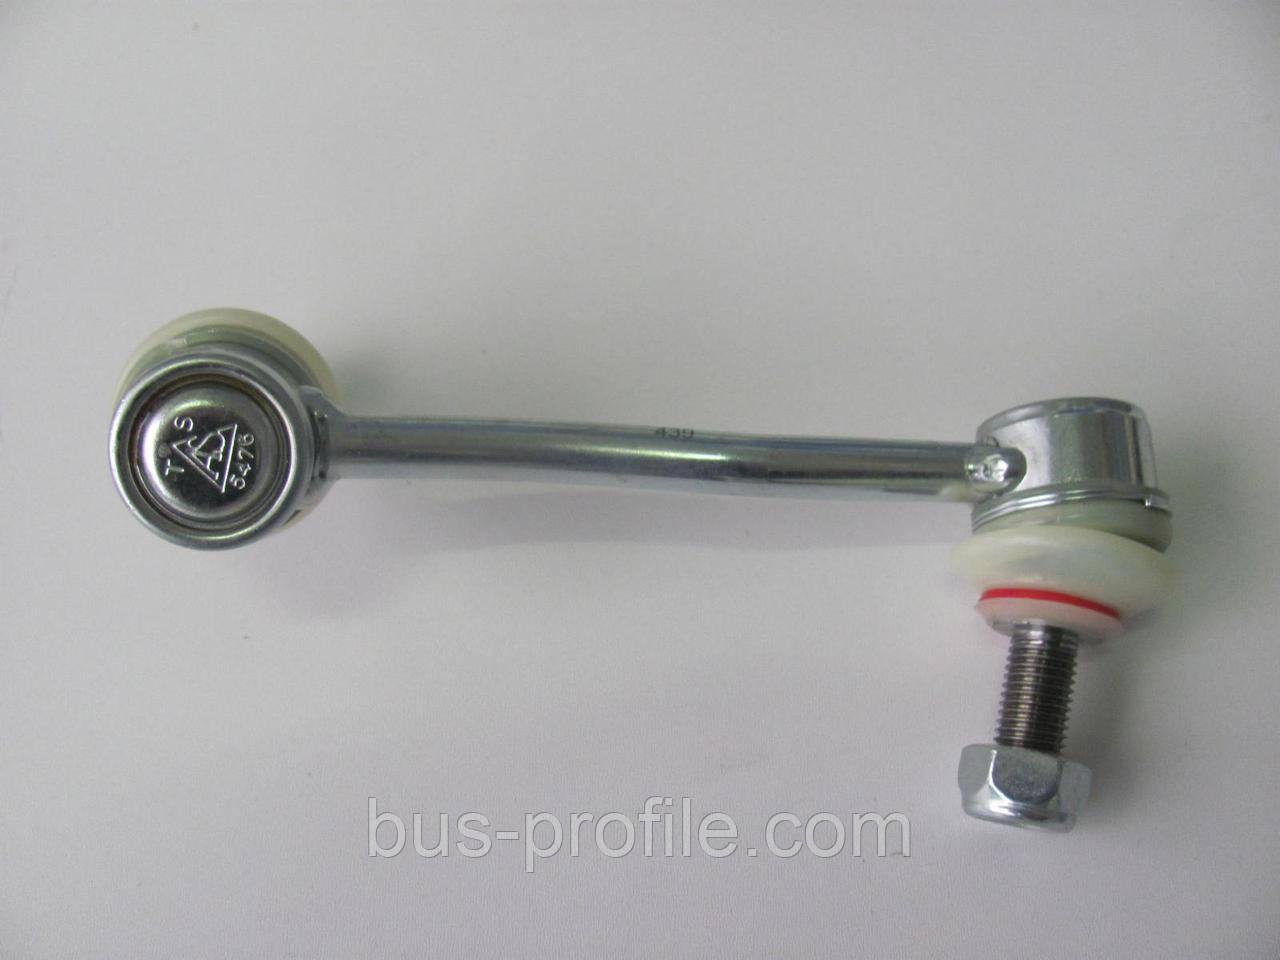 Тяга стабилизатора (R) на MB Sprinter 906, VW Crafter 2006→ — AS Metal (Турция) — 26MR0106